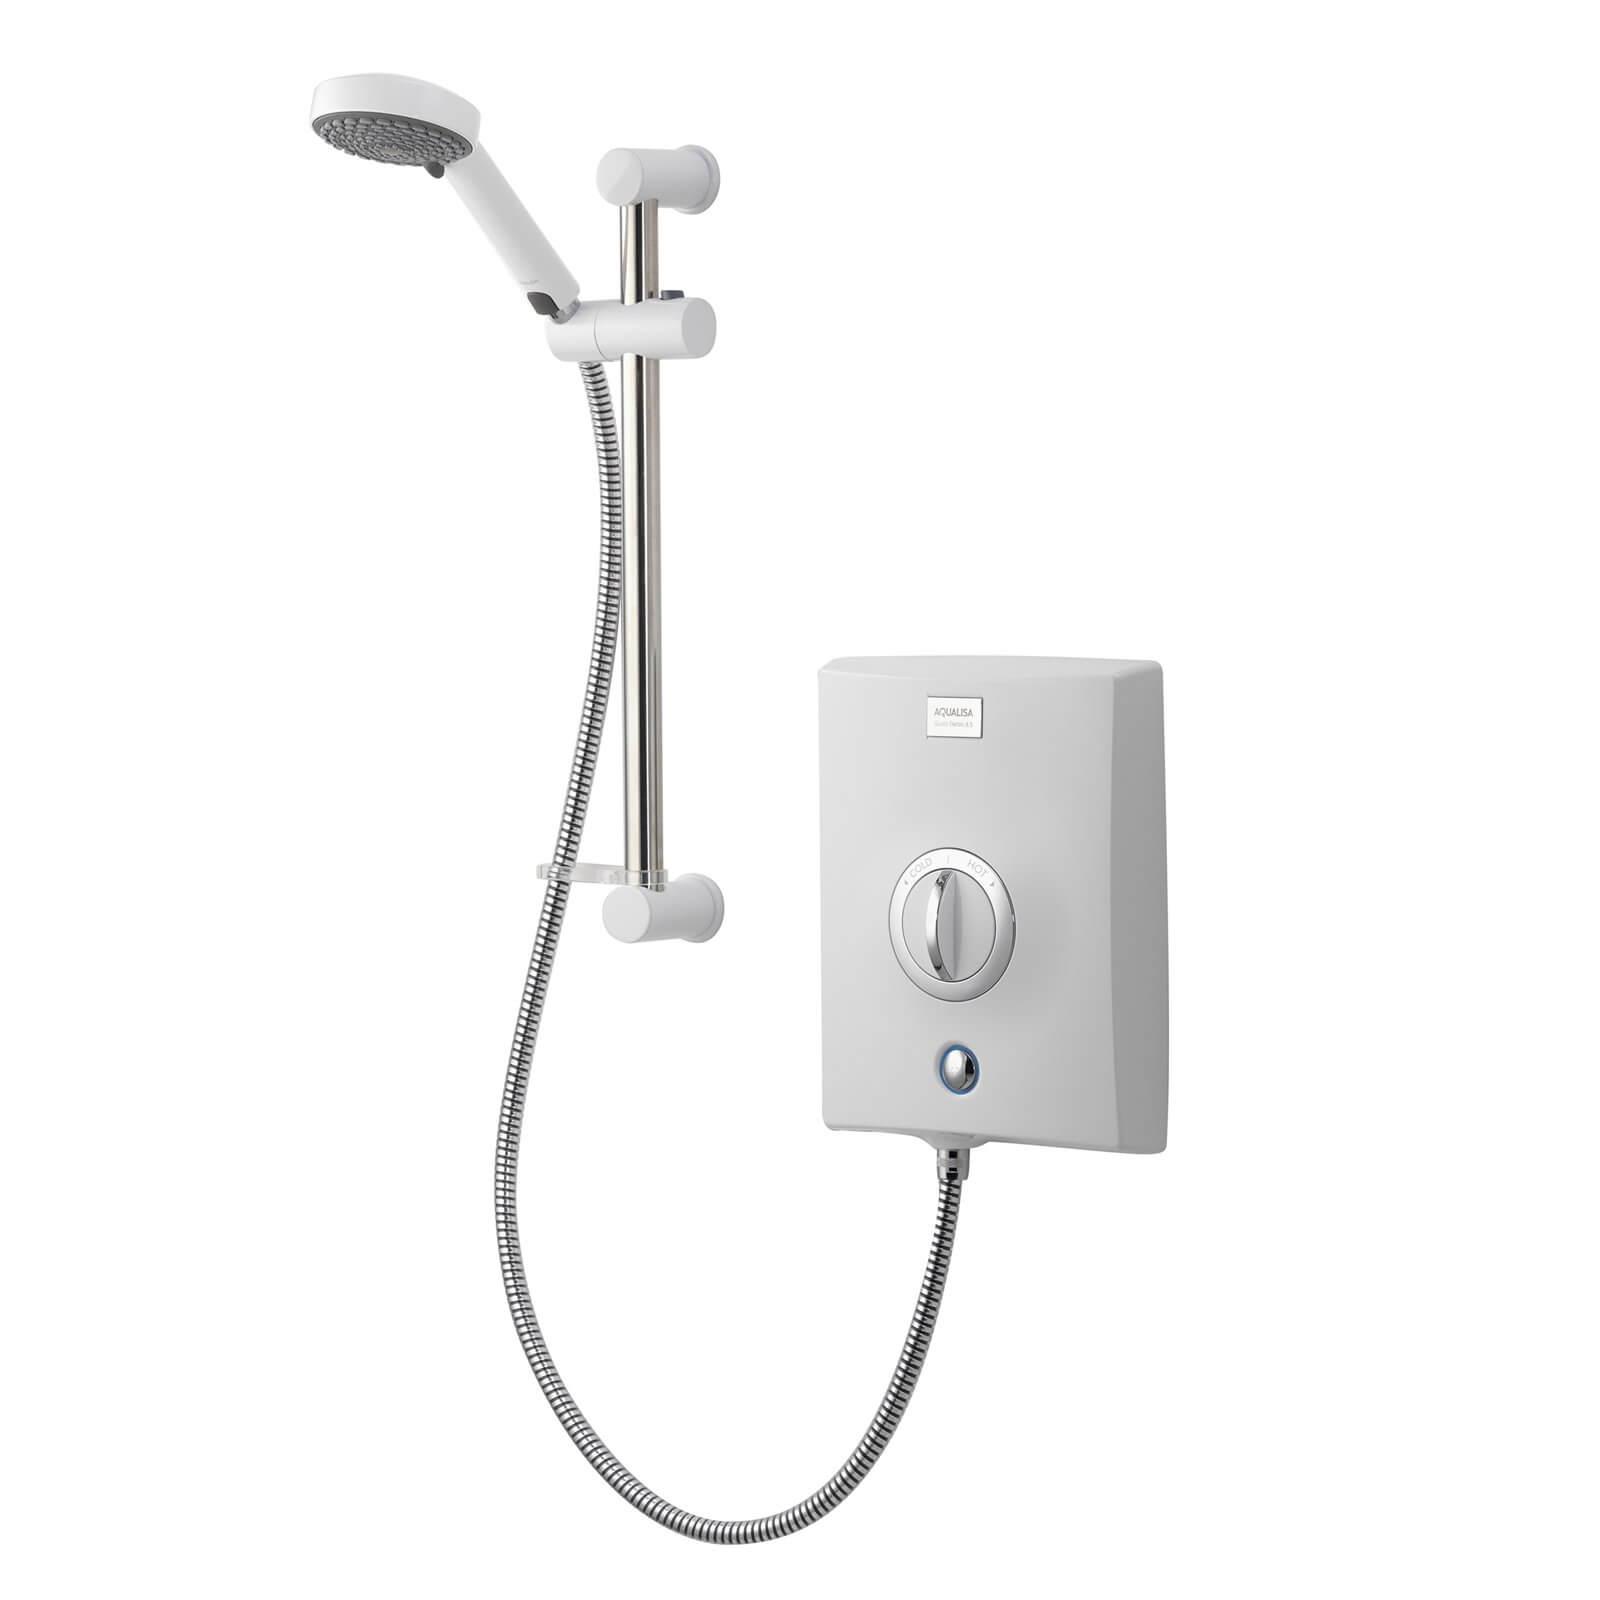 Aqualisa Quartz 8.5kW Electric Shower - White/Chrome